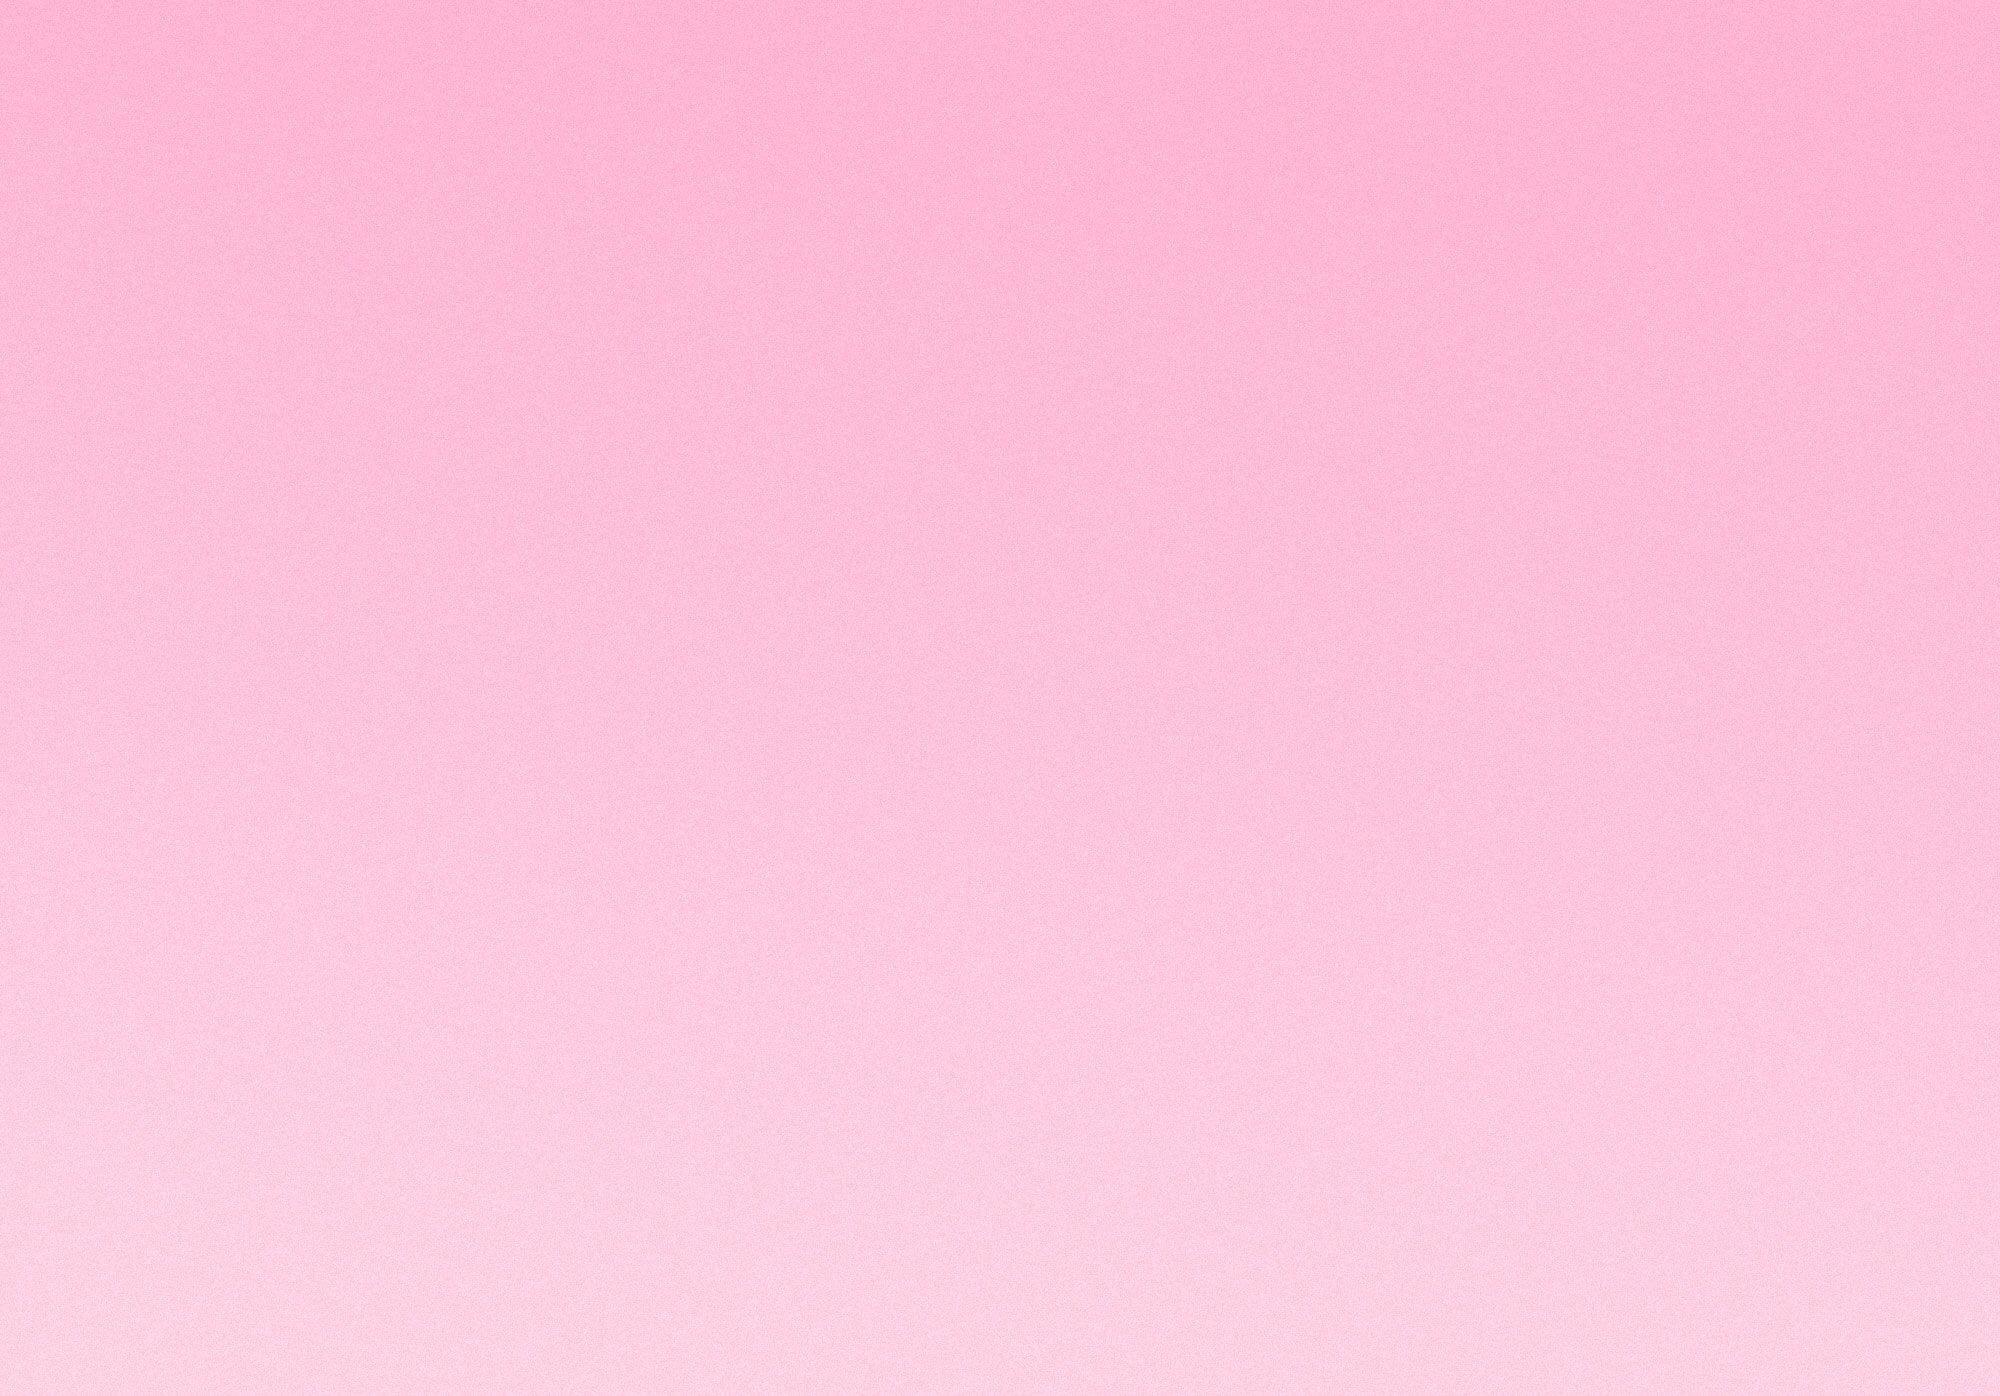 Background shape, pink gradient